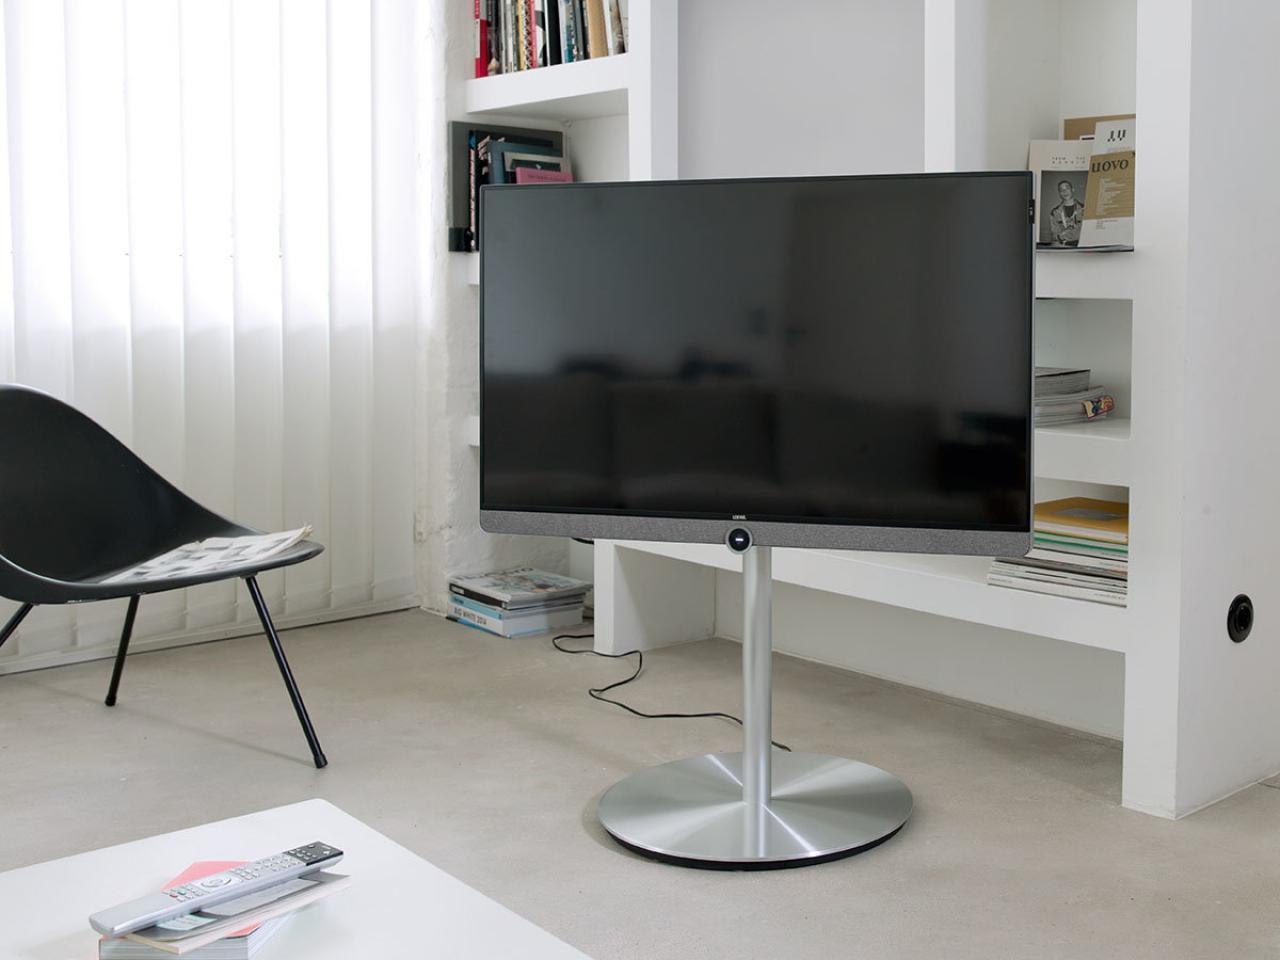 loewe bild 3 fernseher ultrahd 4k tv. Black Bedroom Furniture Sets. Home Design Ideas